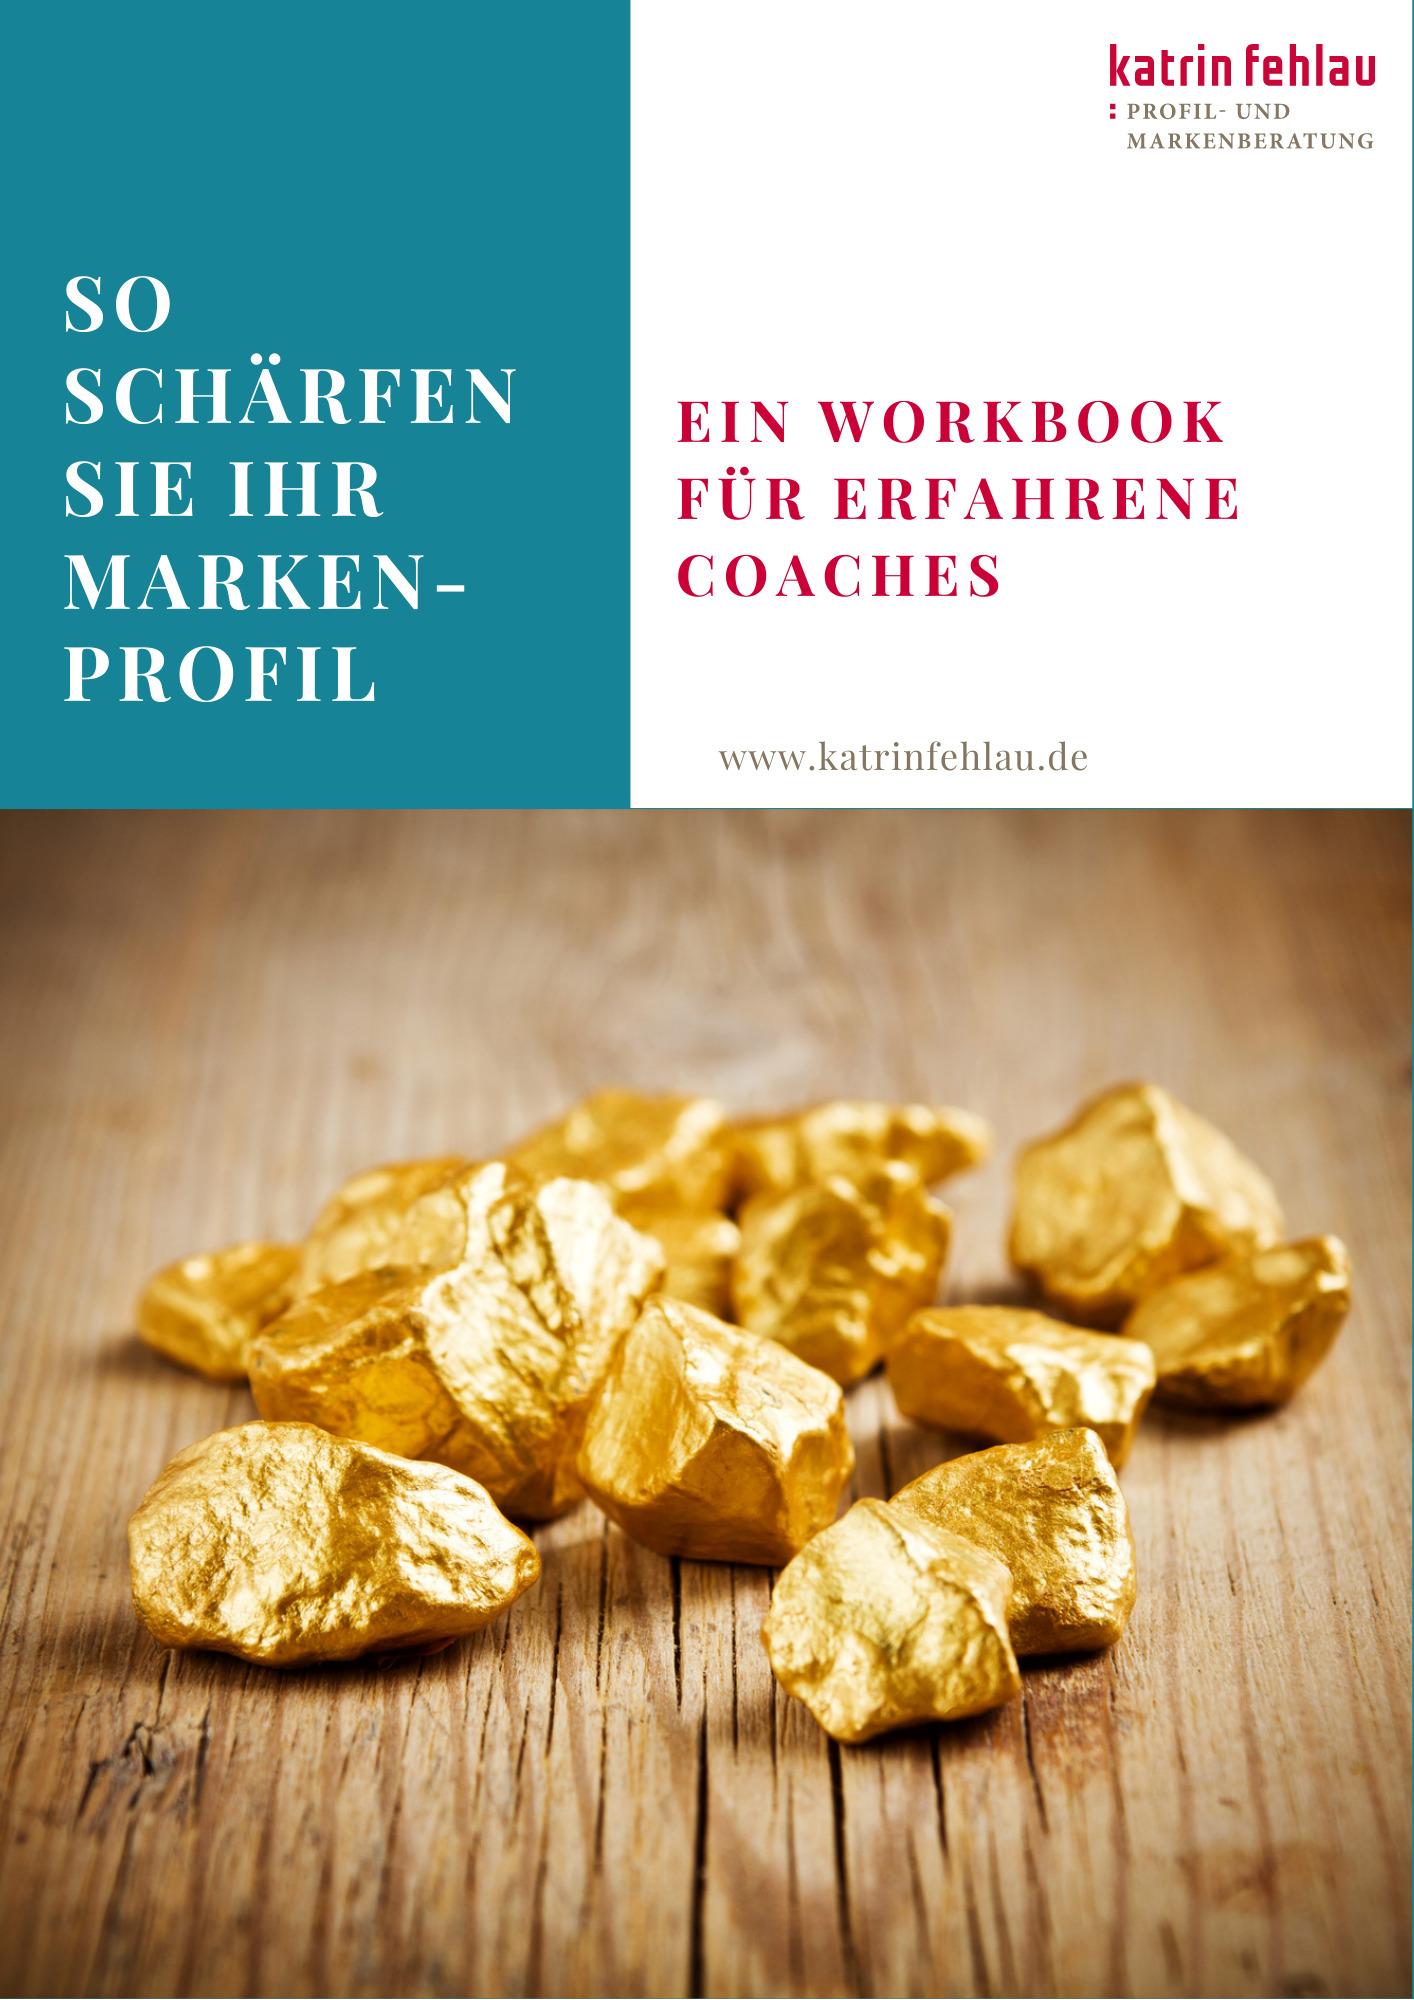 Gratis-Workbook-Katrin-Fehlau